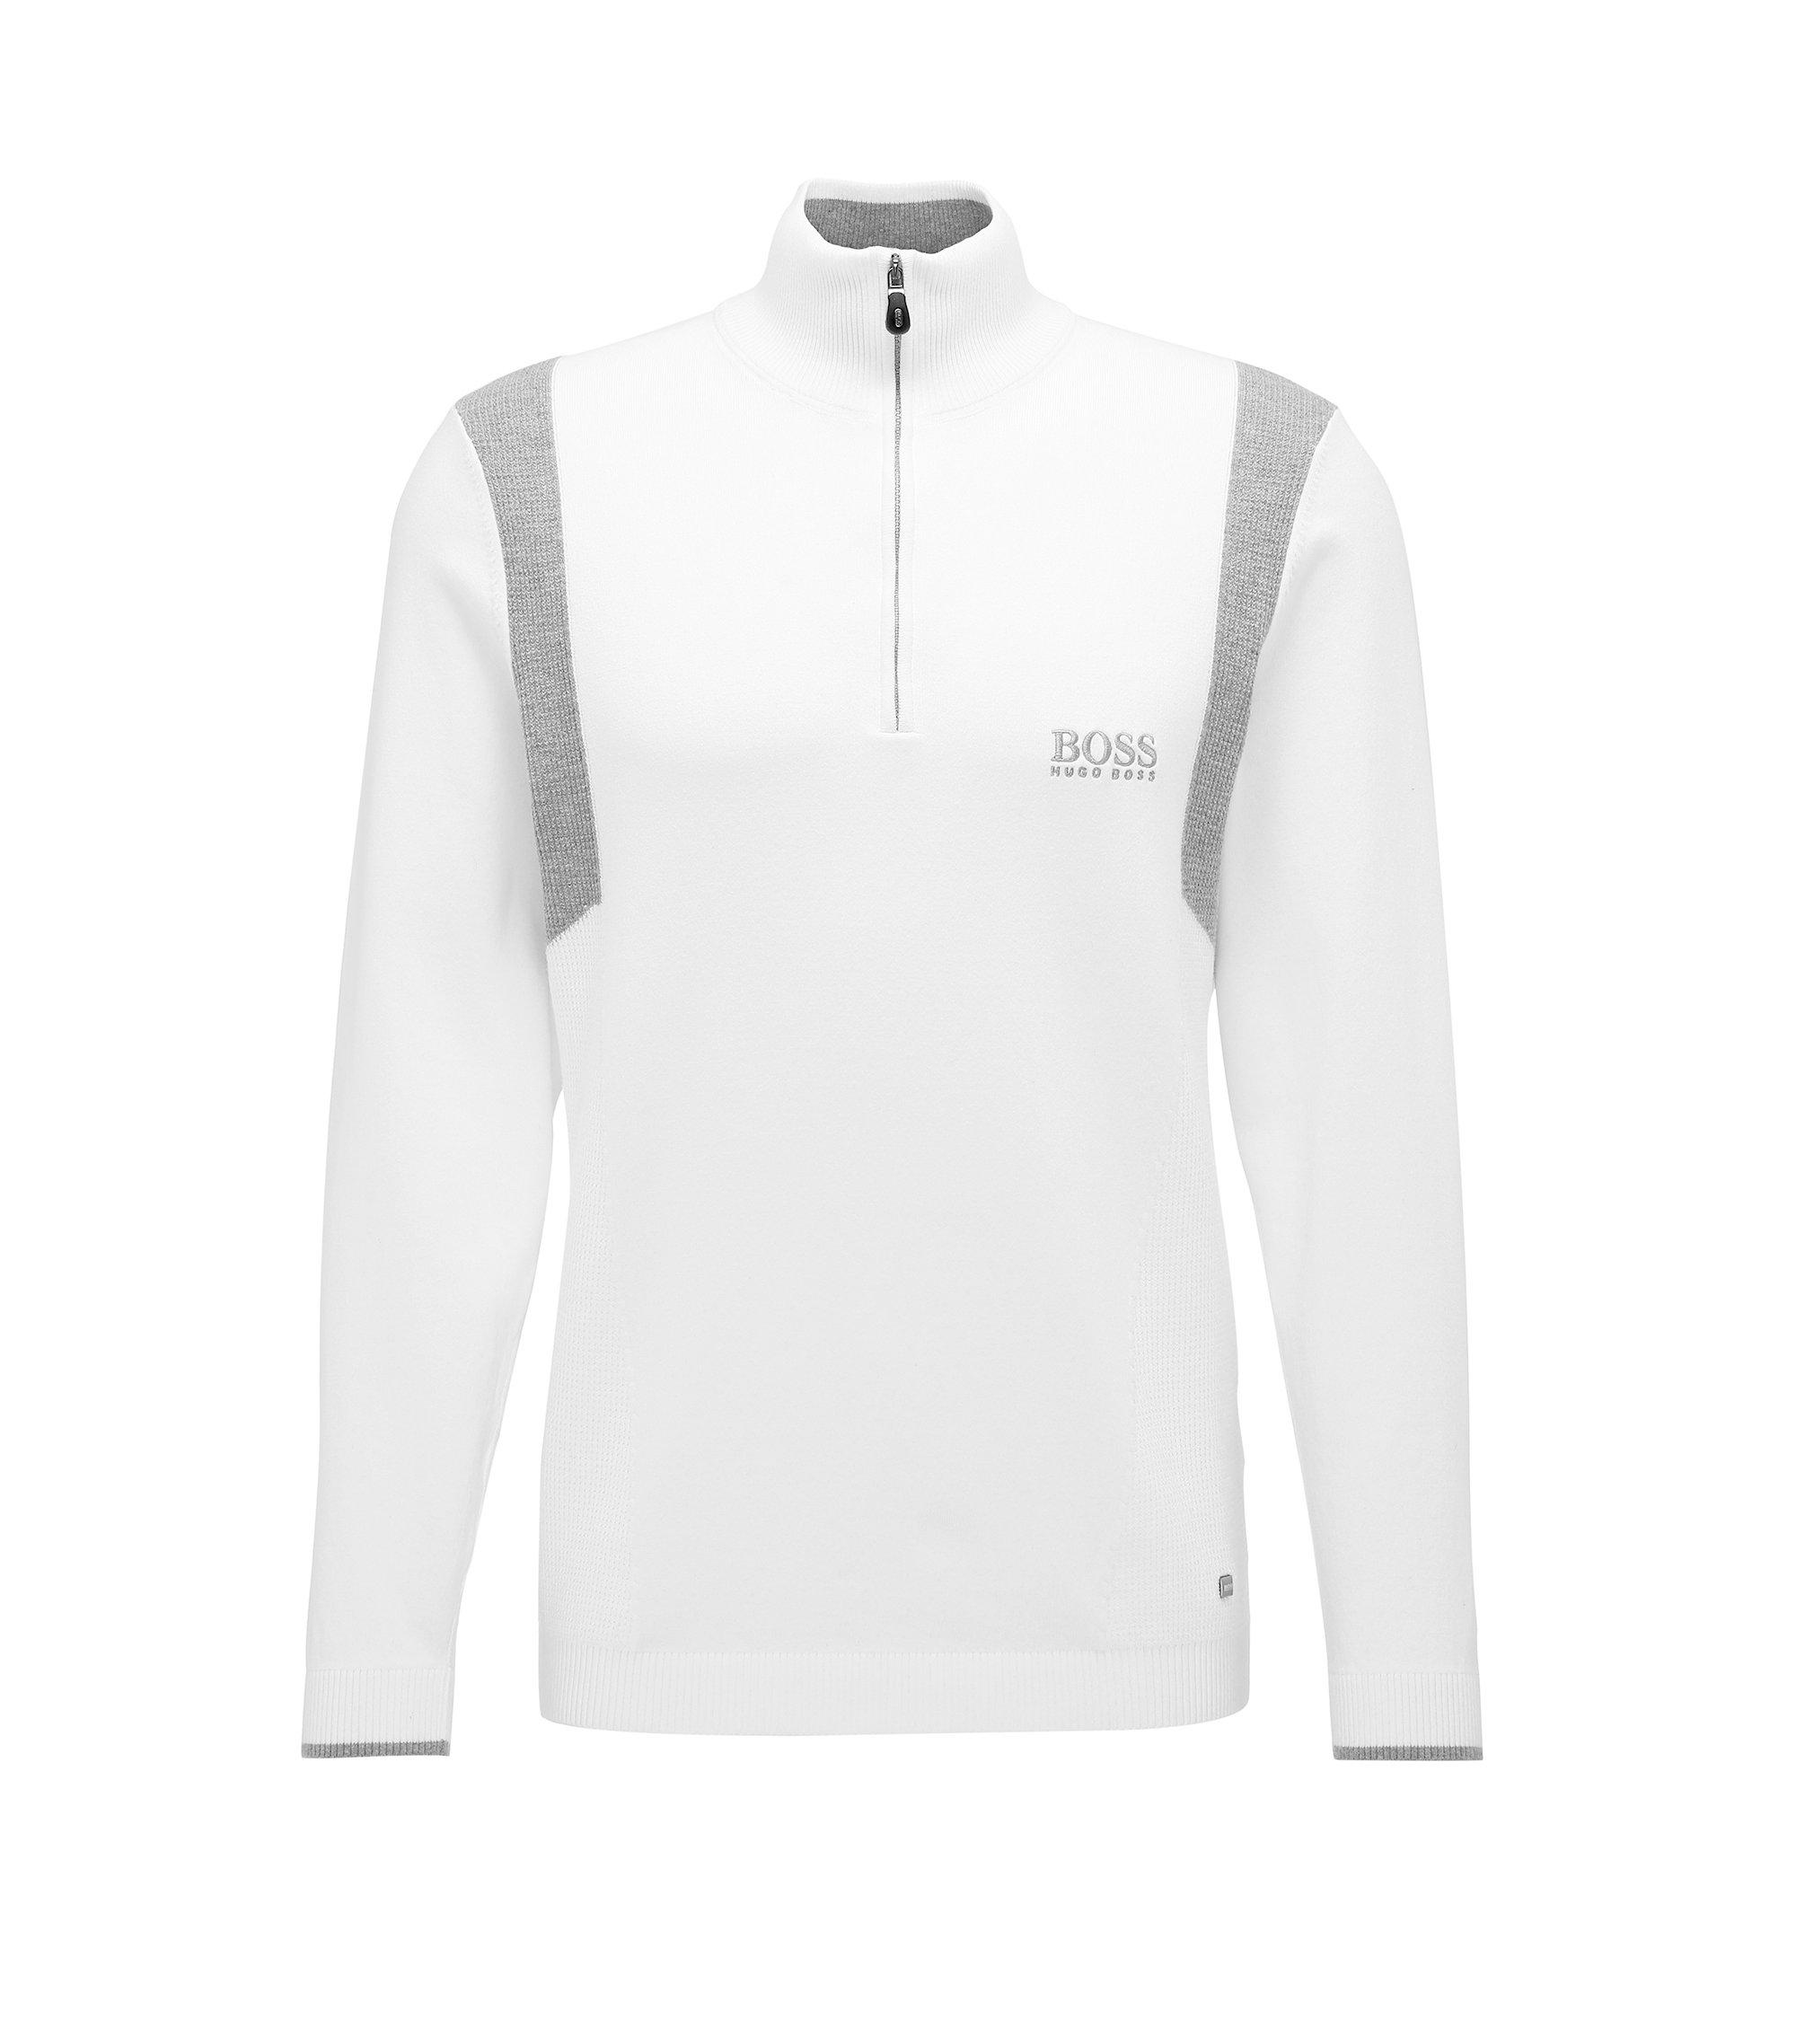 Water-Repellent Stretch Cotton Sweater | Zelichior Pro S17, White